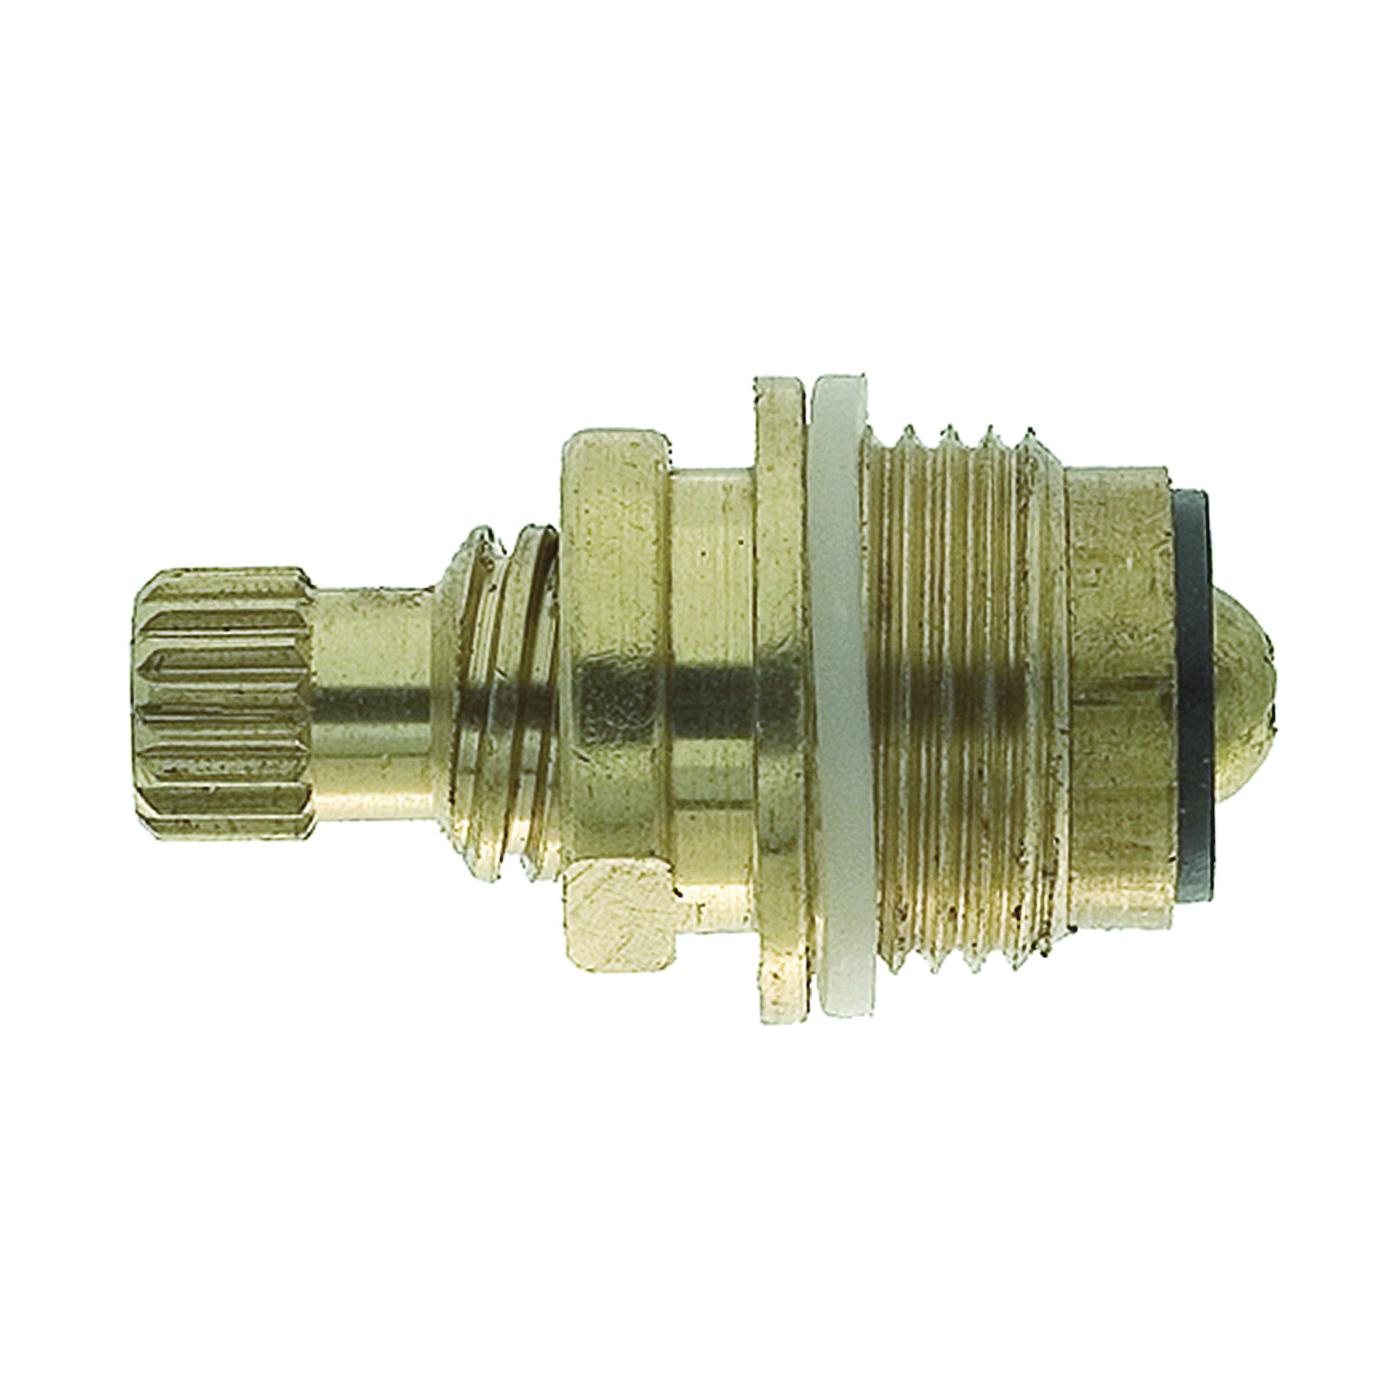 Picture of Danco 15334E Faucet Stem, Brass, Brass, 1-17/32 in L